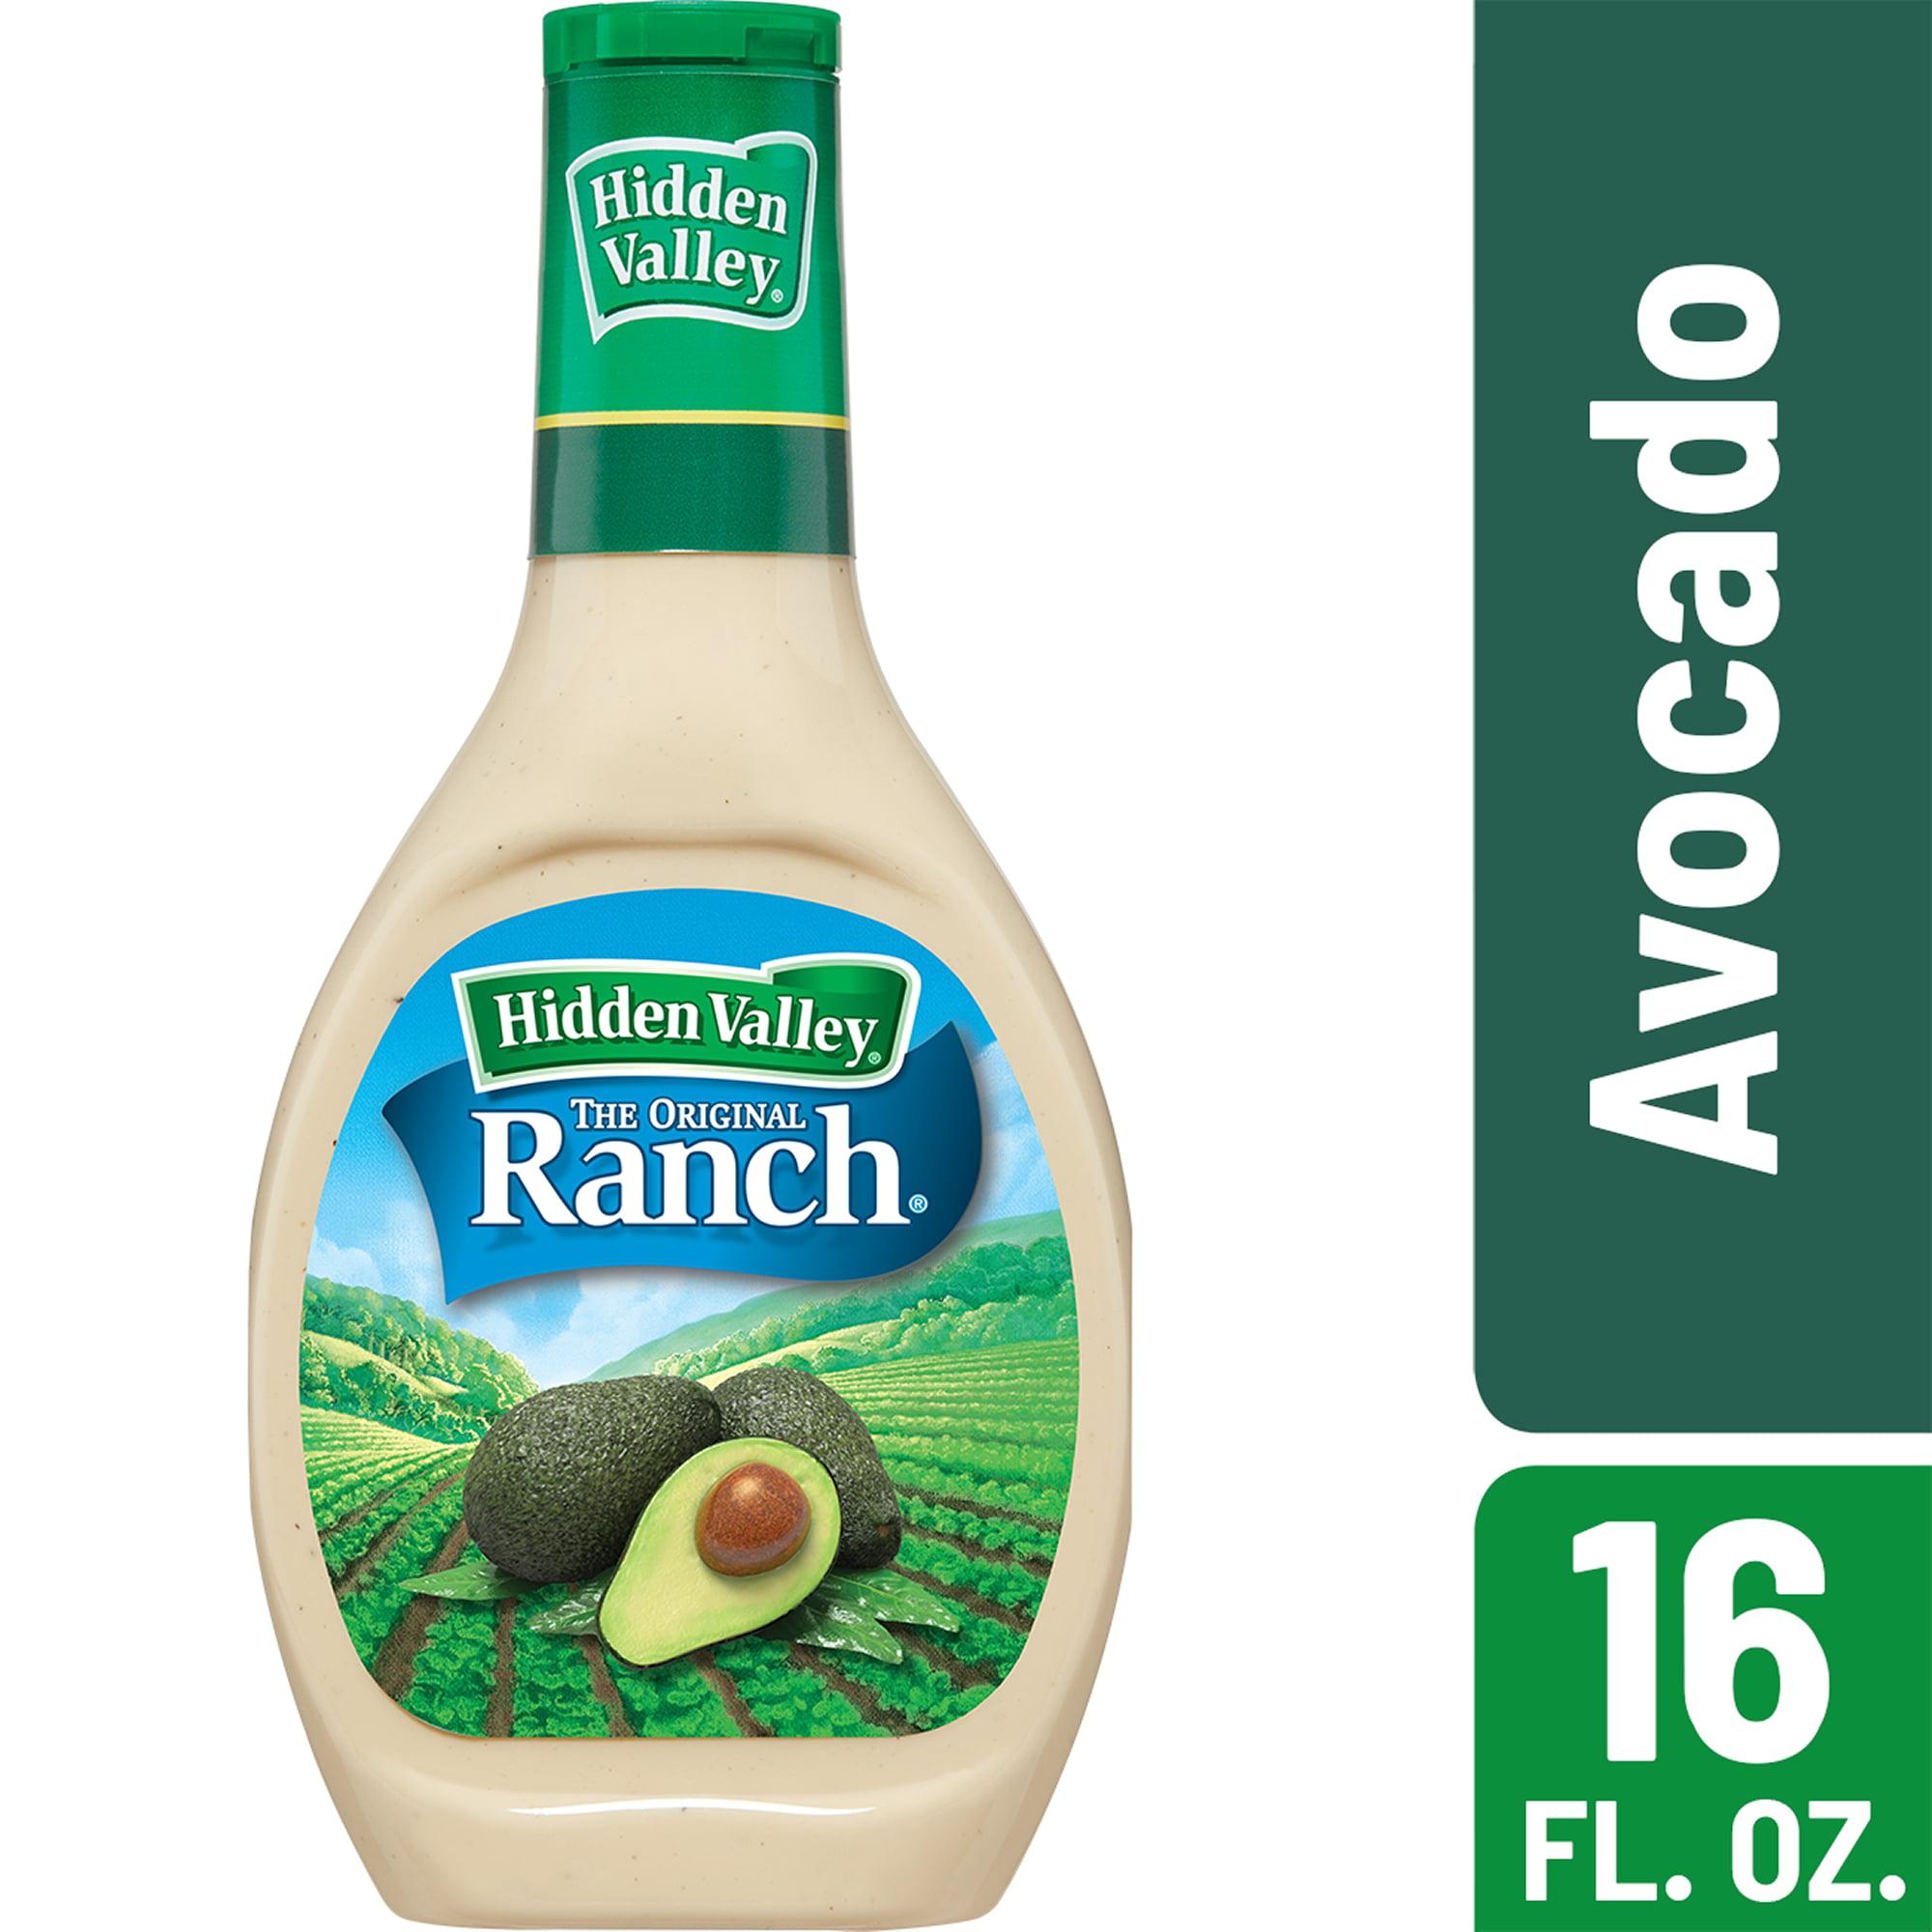 Hidden Valley Avocado Ranch Salad Dressing & Topping, Gluten Free - 16 oz Bottle